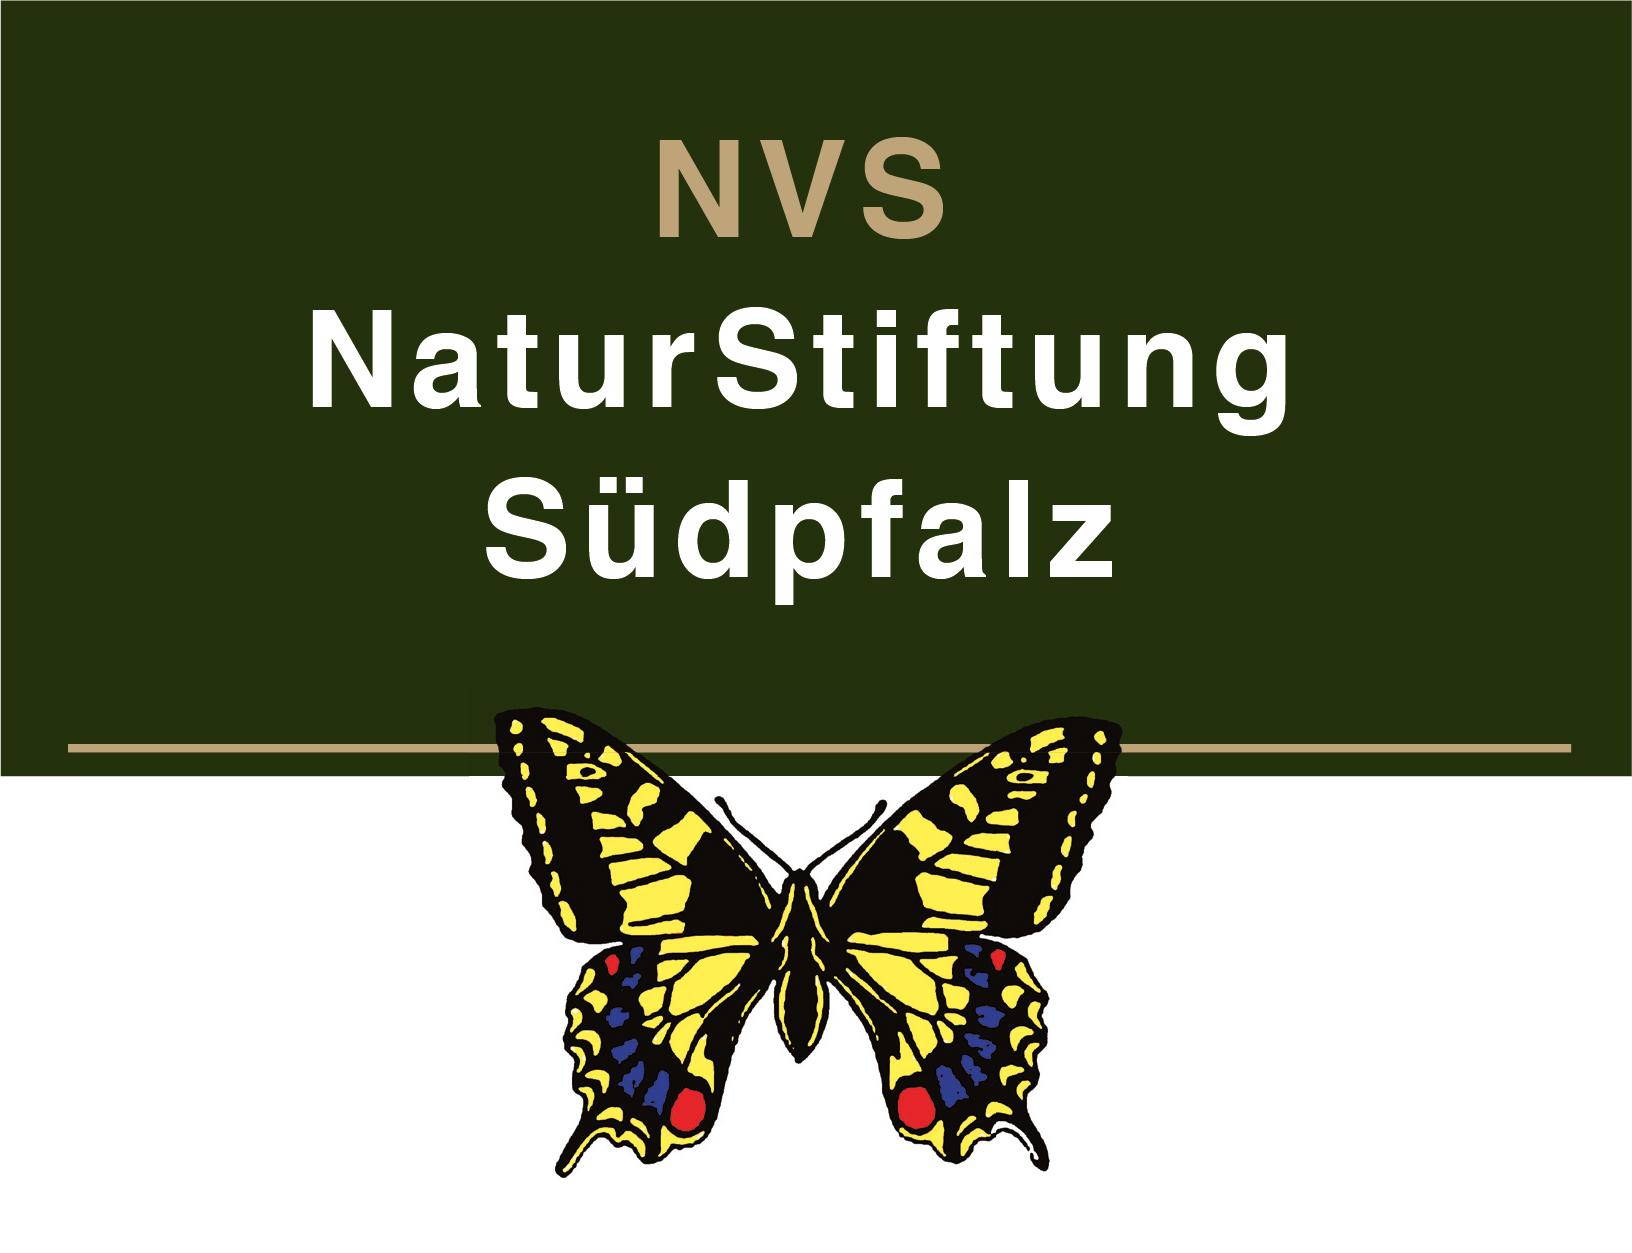 neues NVS NaturStiftung Südpfalz Logo